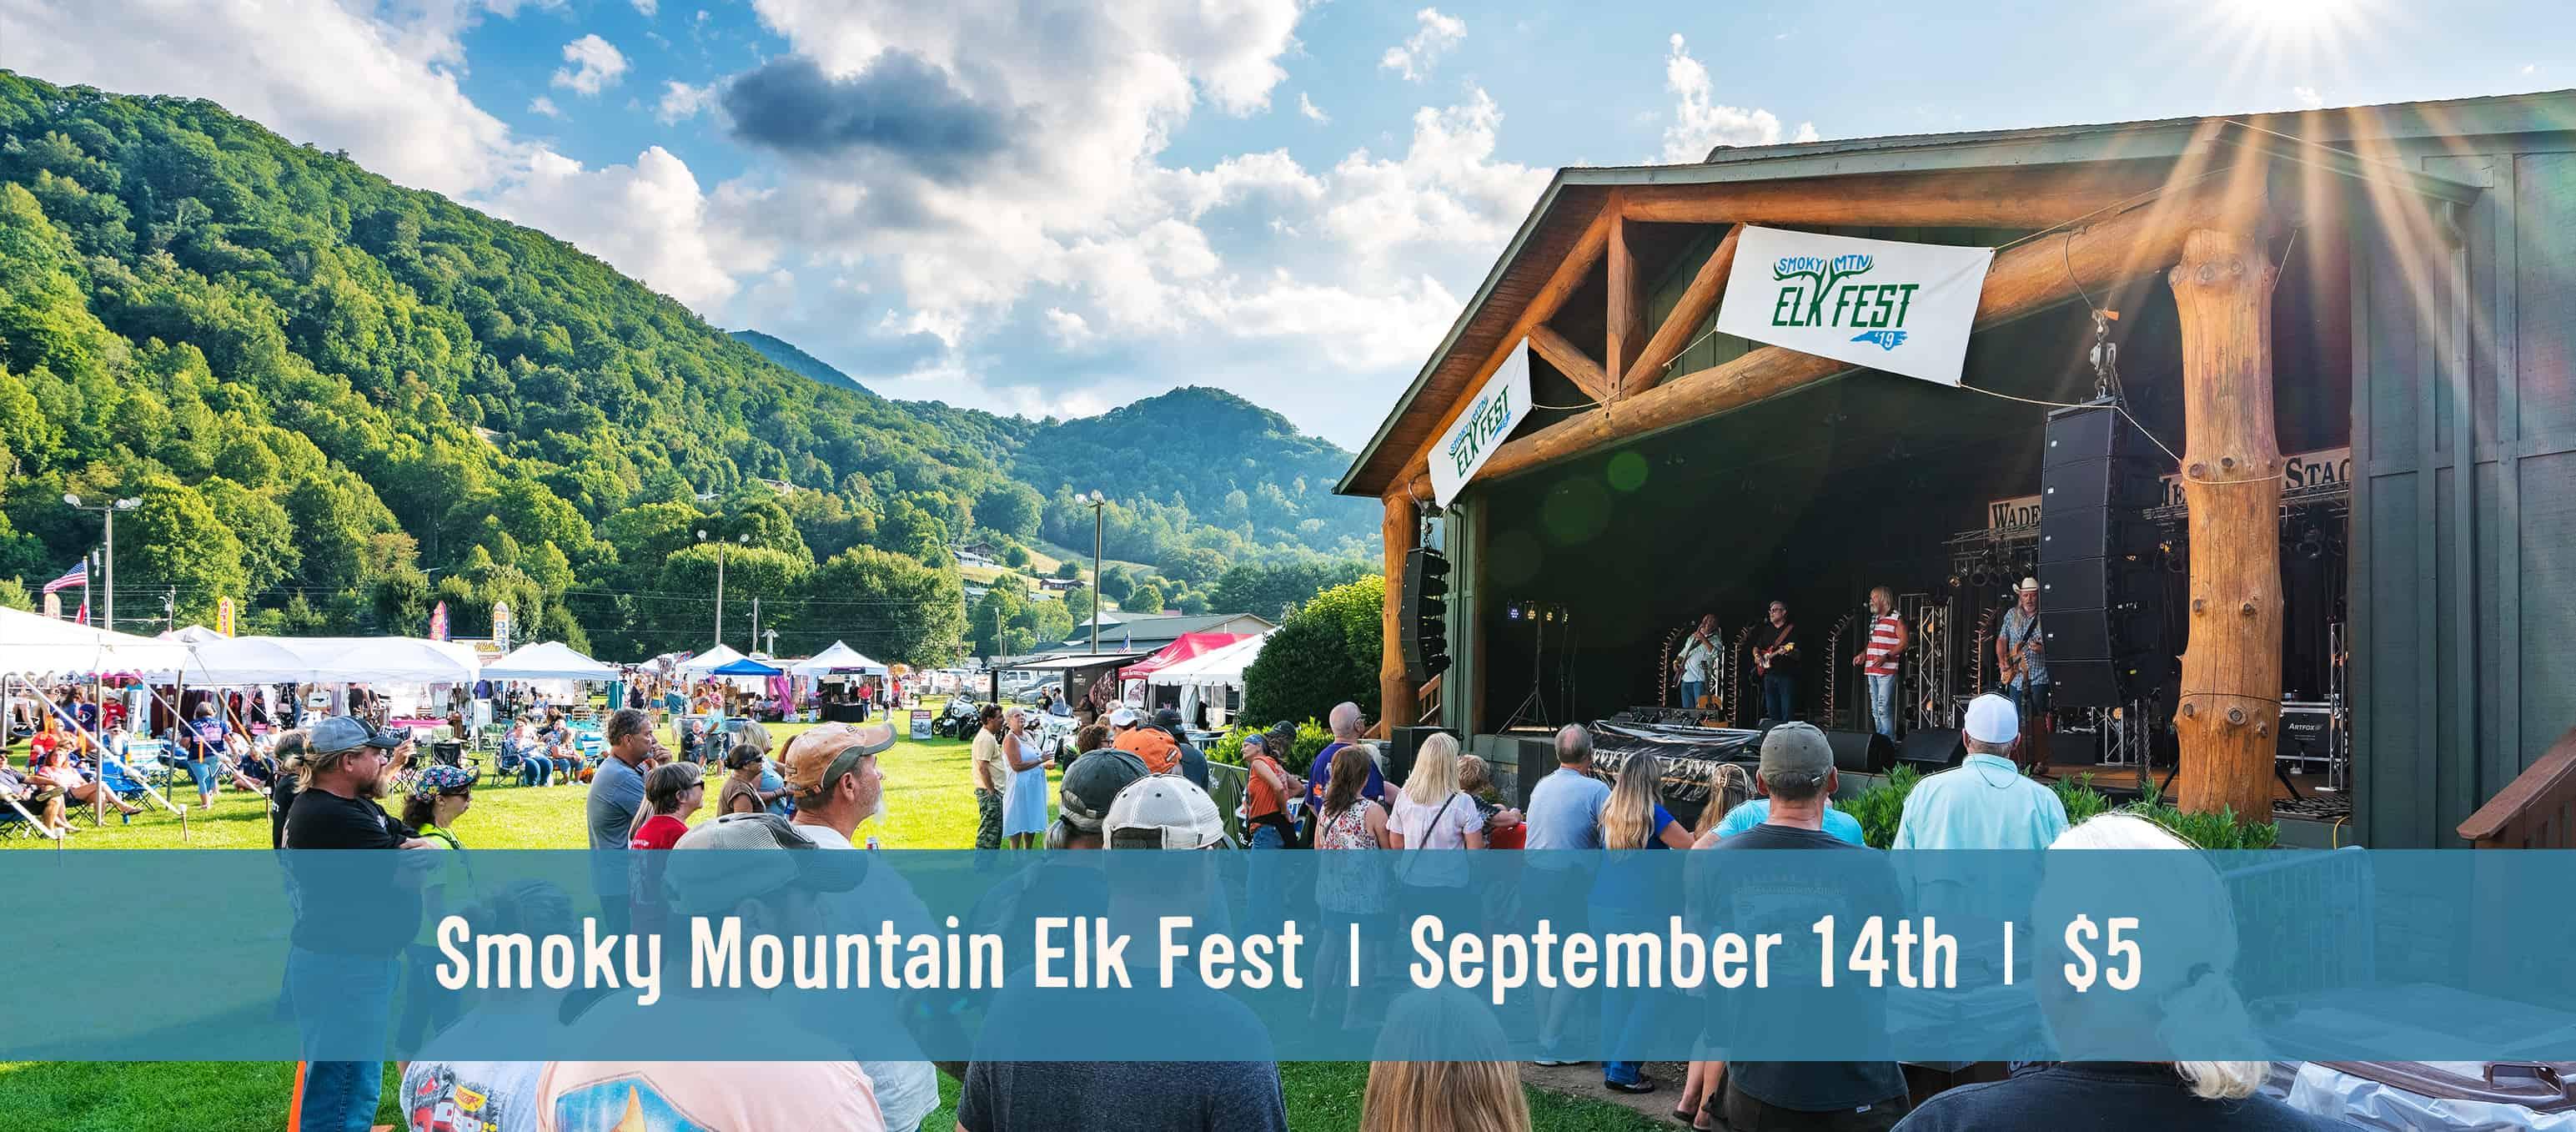 Smoky Mountain Elk Fest